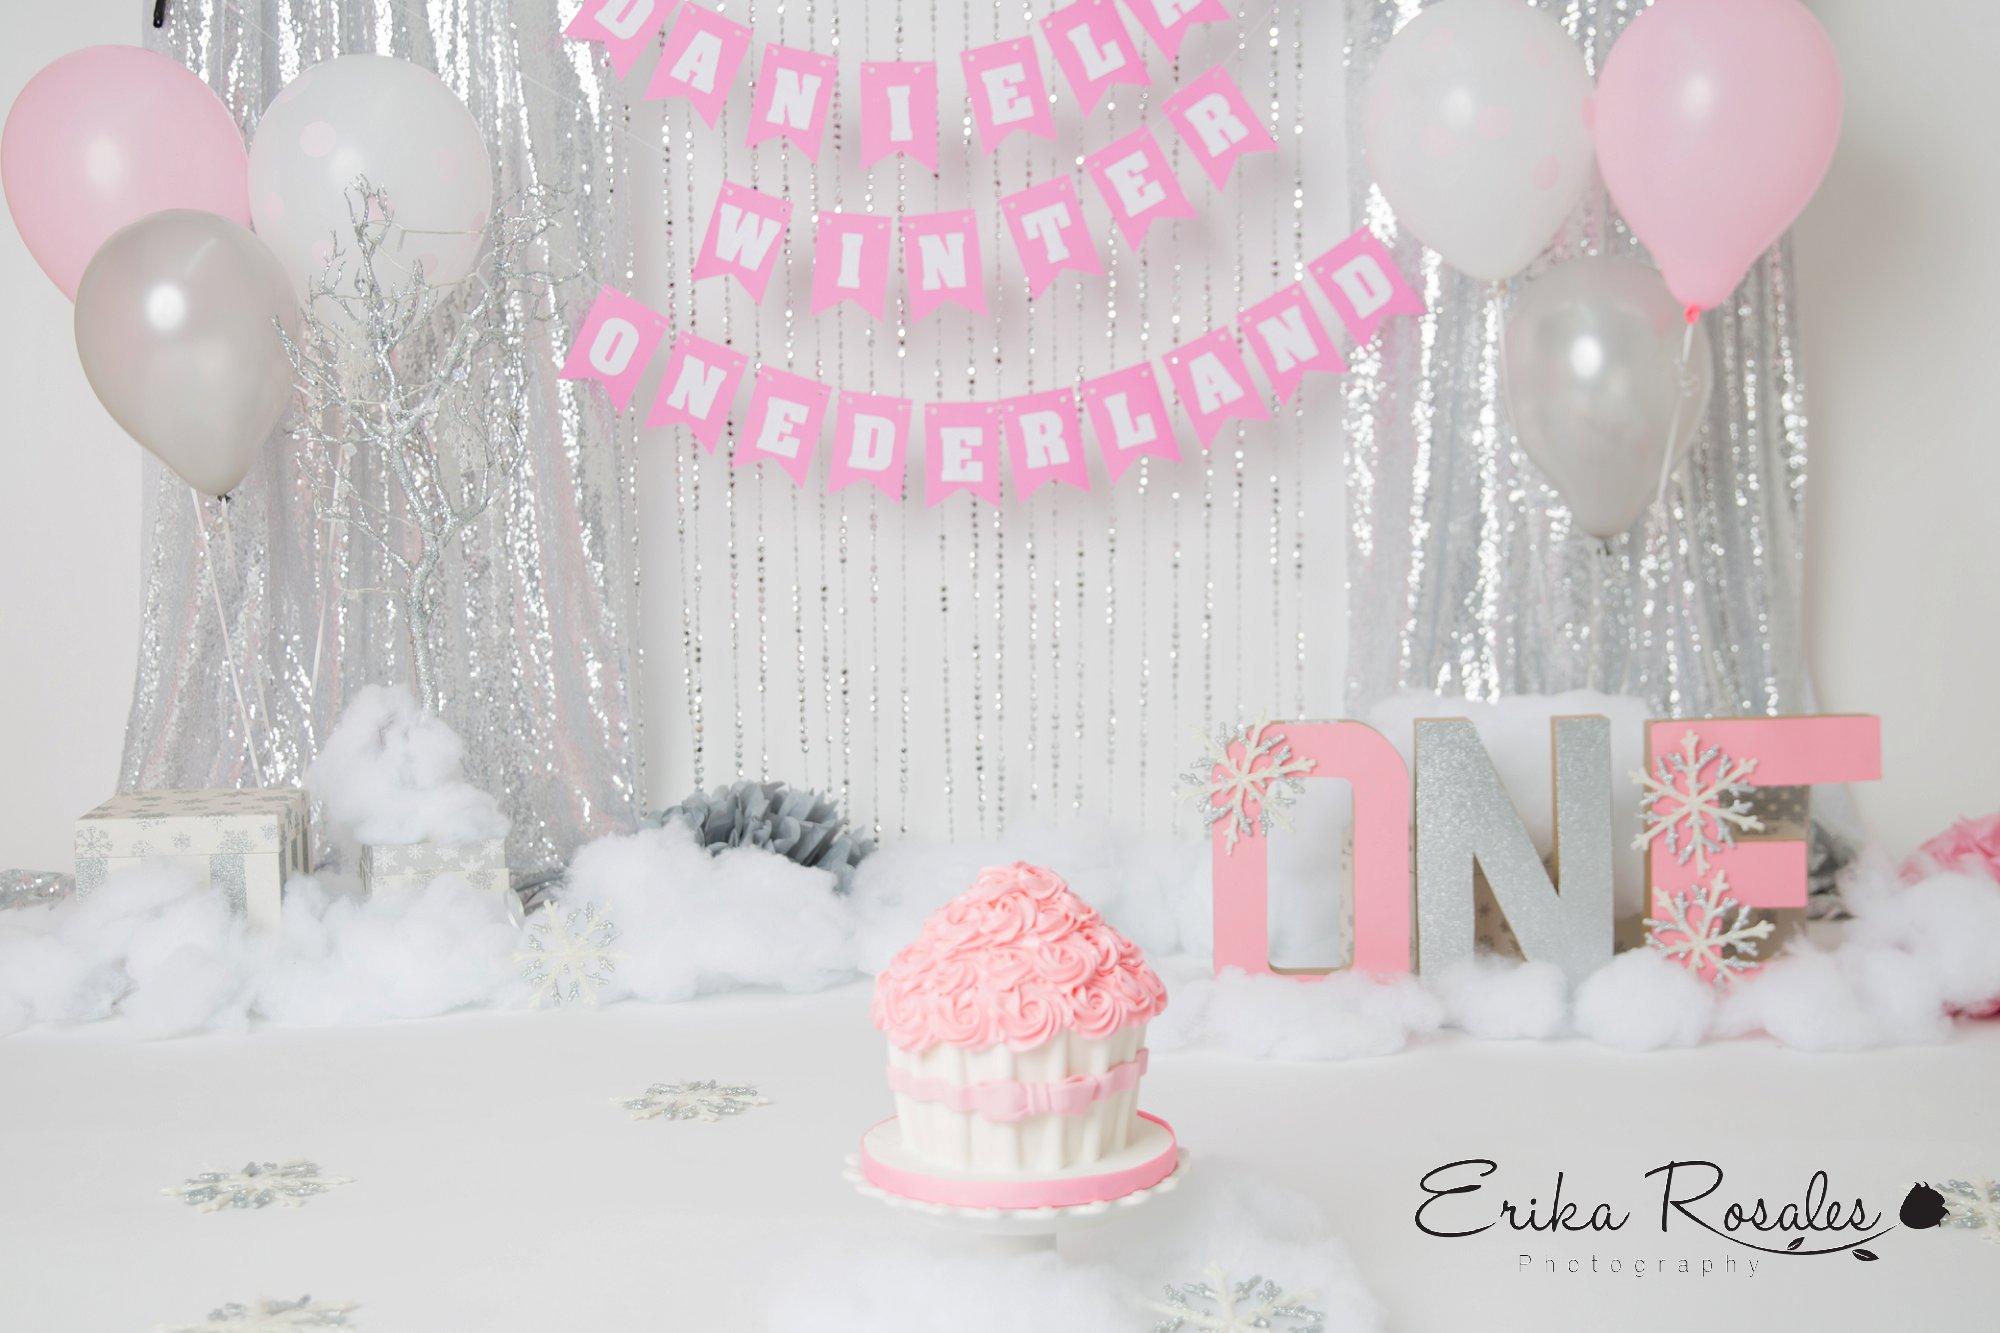 Cake Smash Birthday Archives Page 2 Of 5 Erika Rosales New York